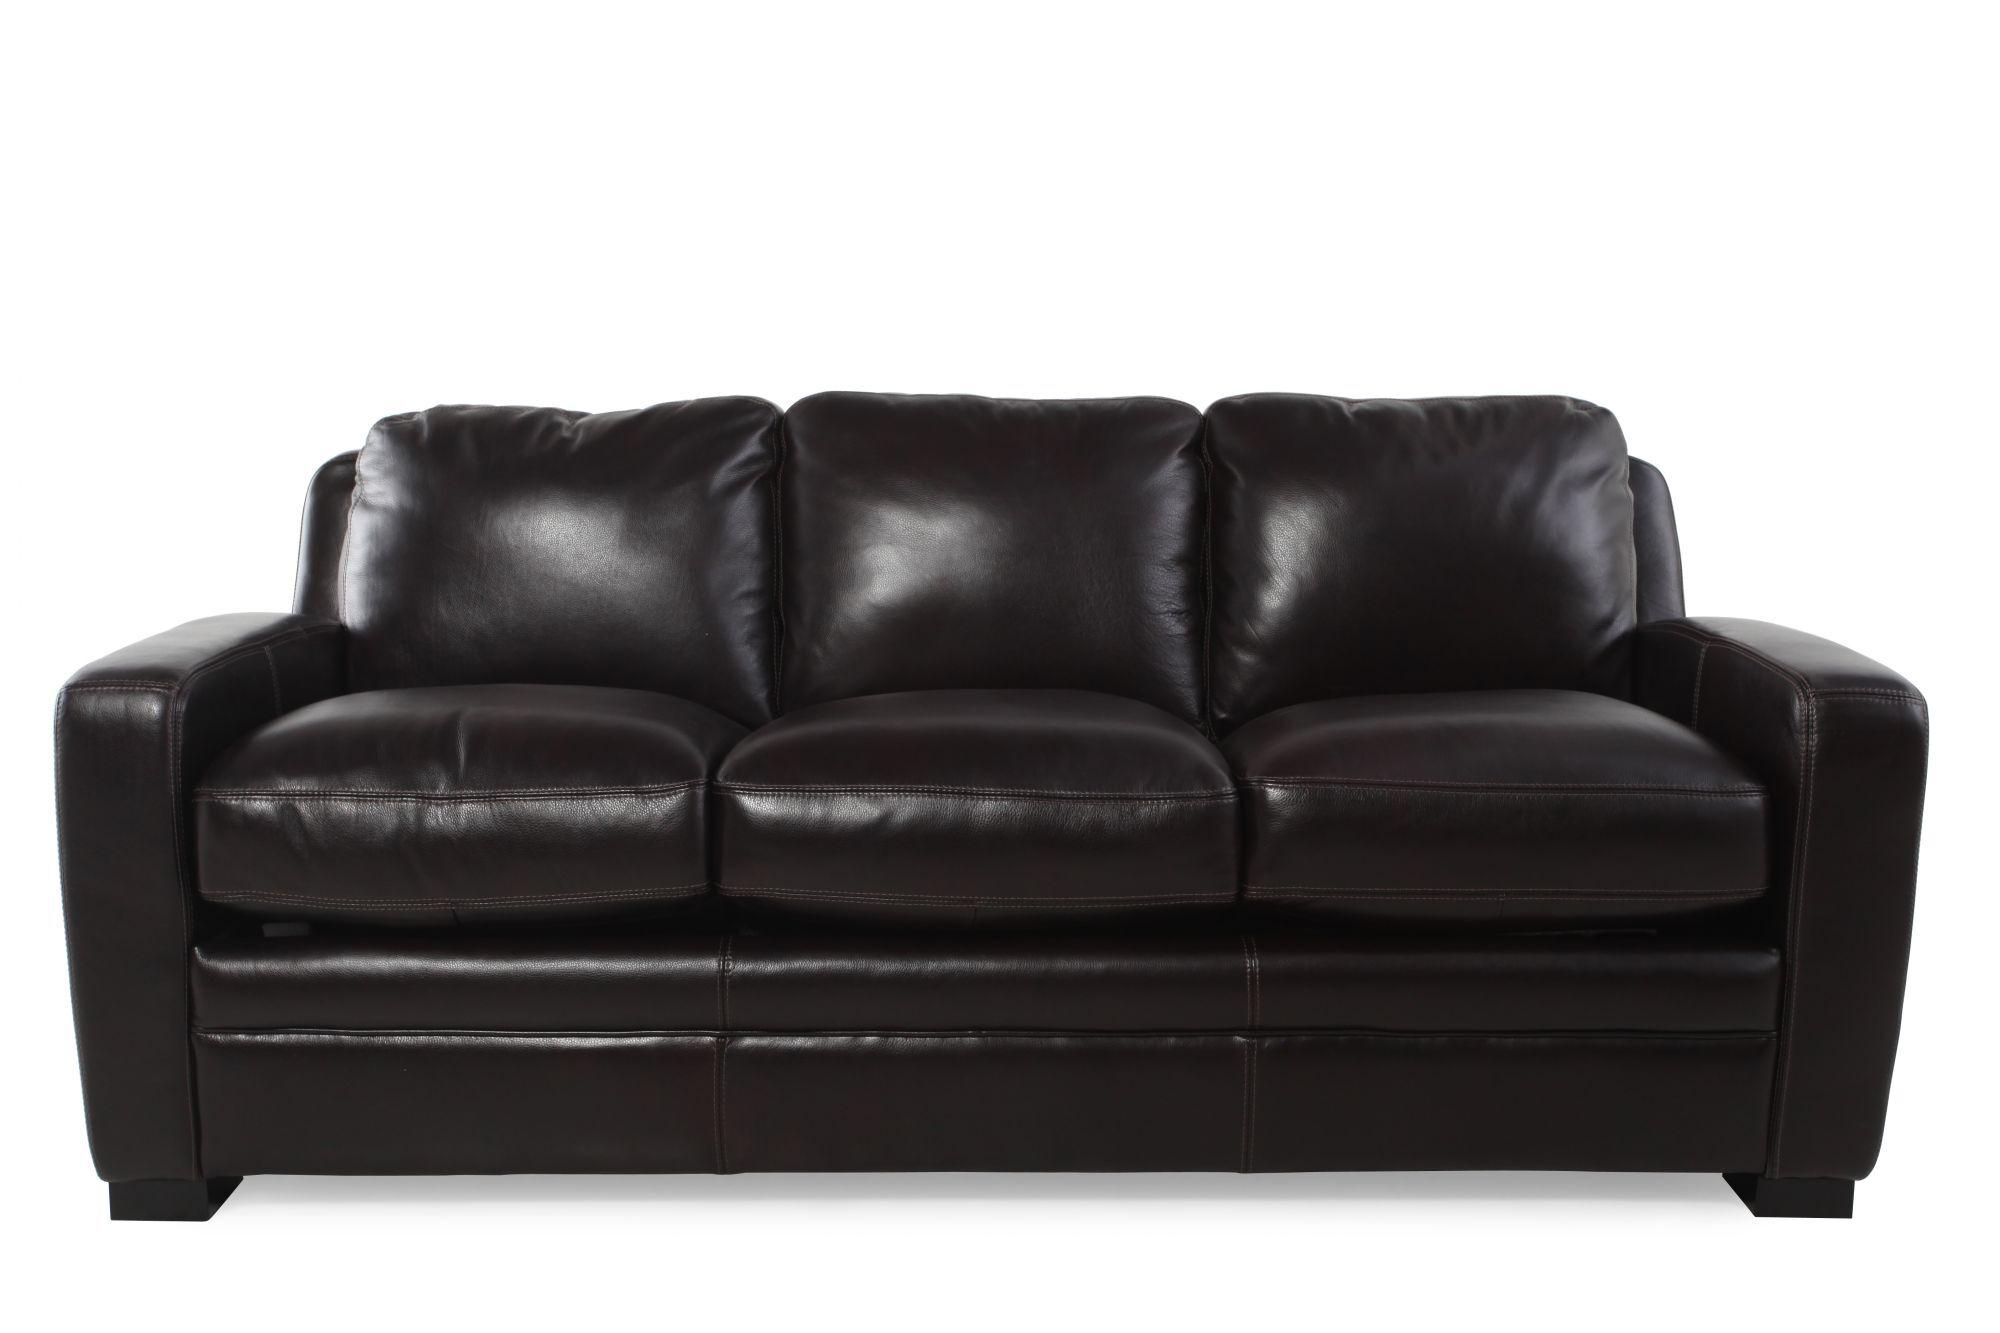 Simon Li Longhorn Blackberry Queen Sleeper Sofa